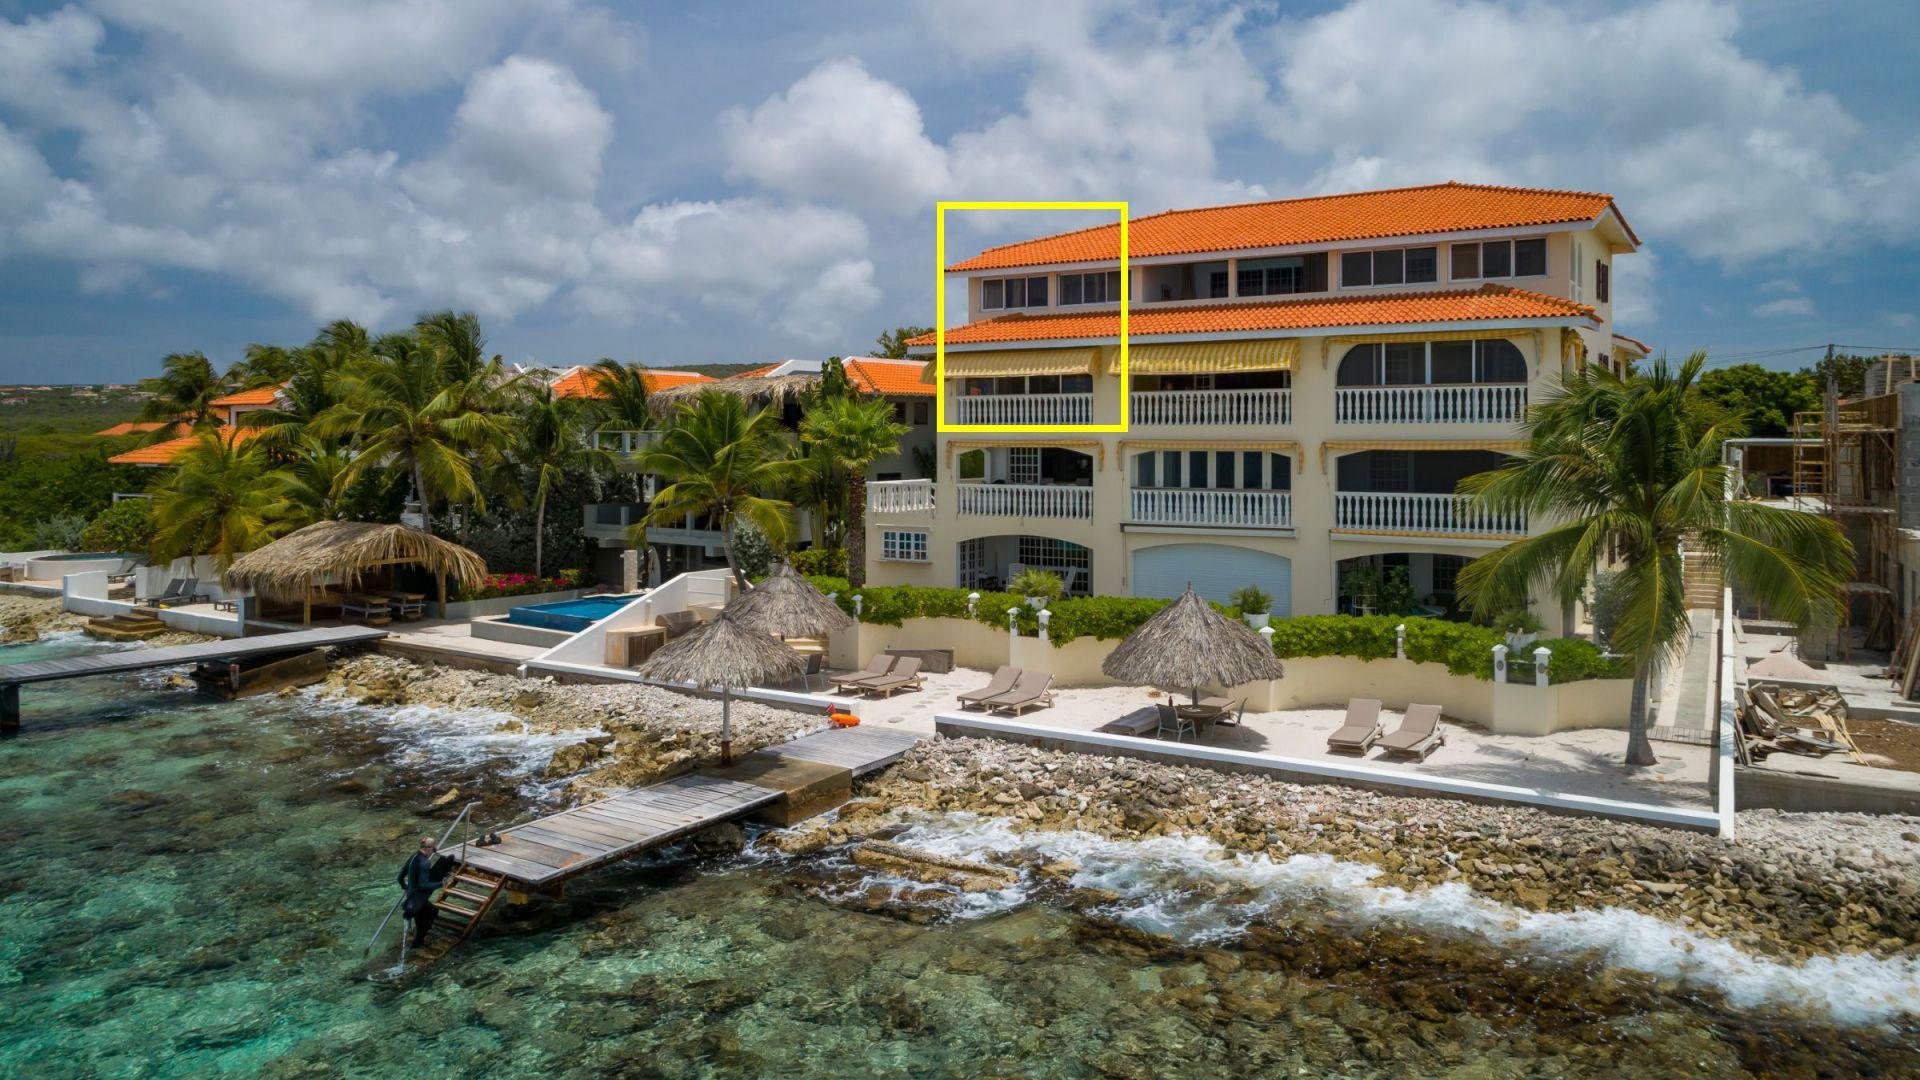 Kaya Gobernador N. Debrot 155-4, Playa Beach Condos 155-4